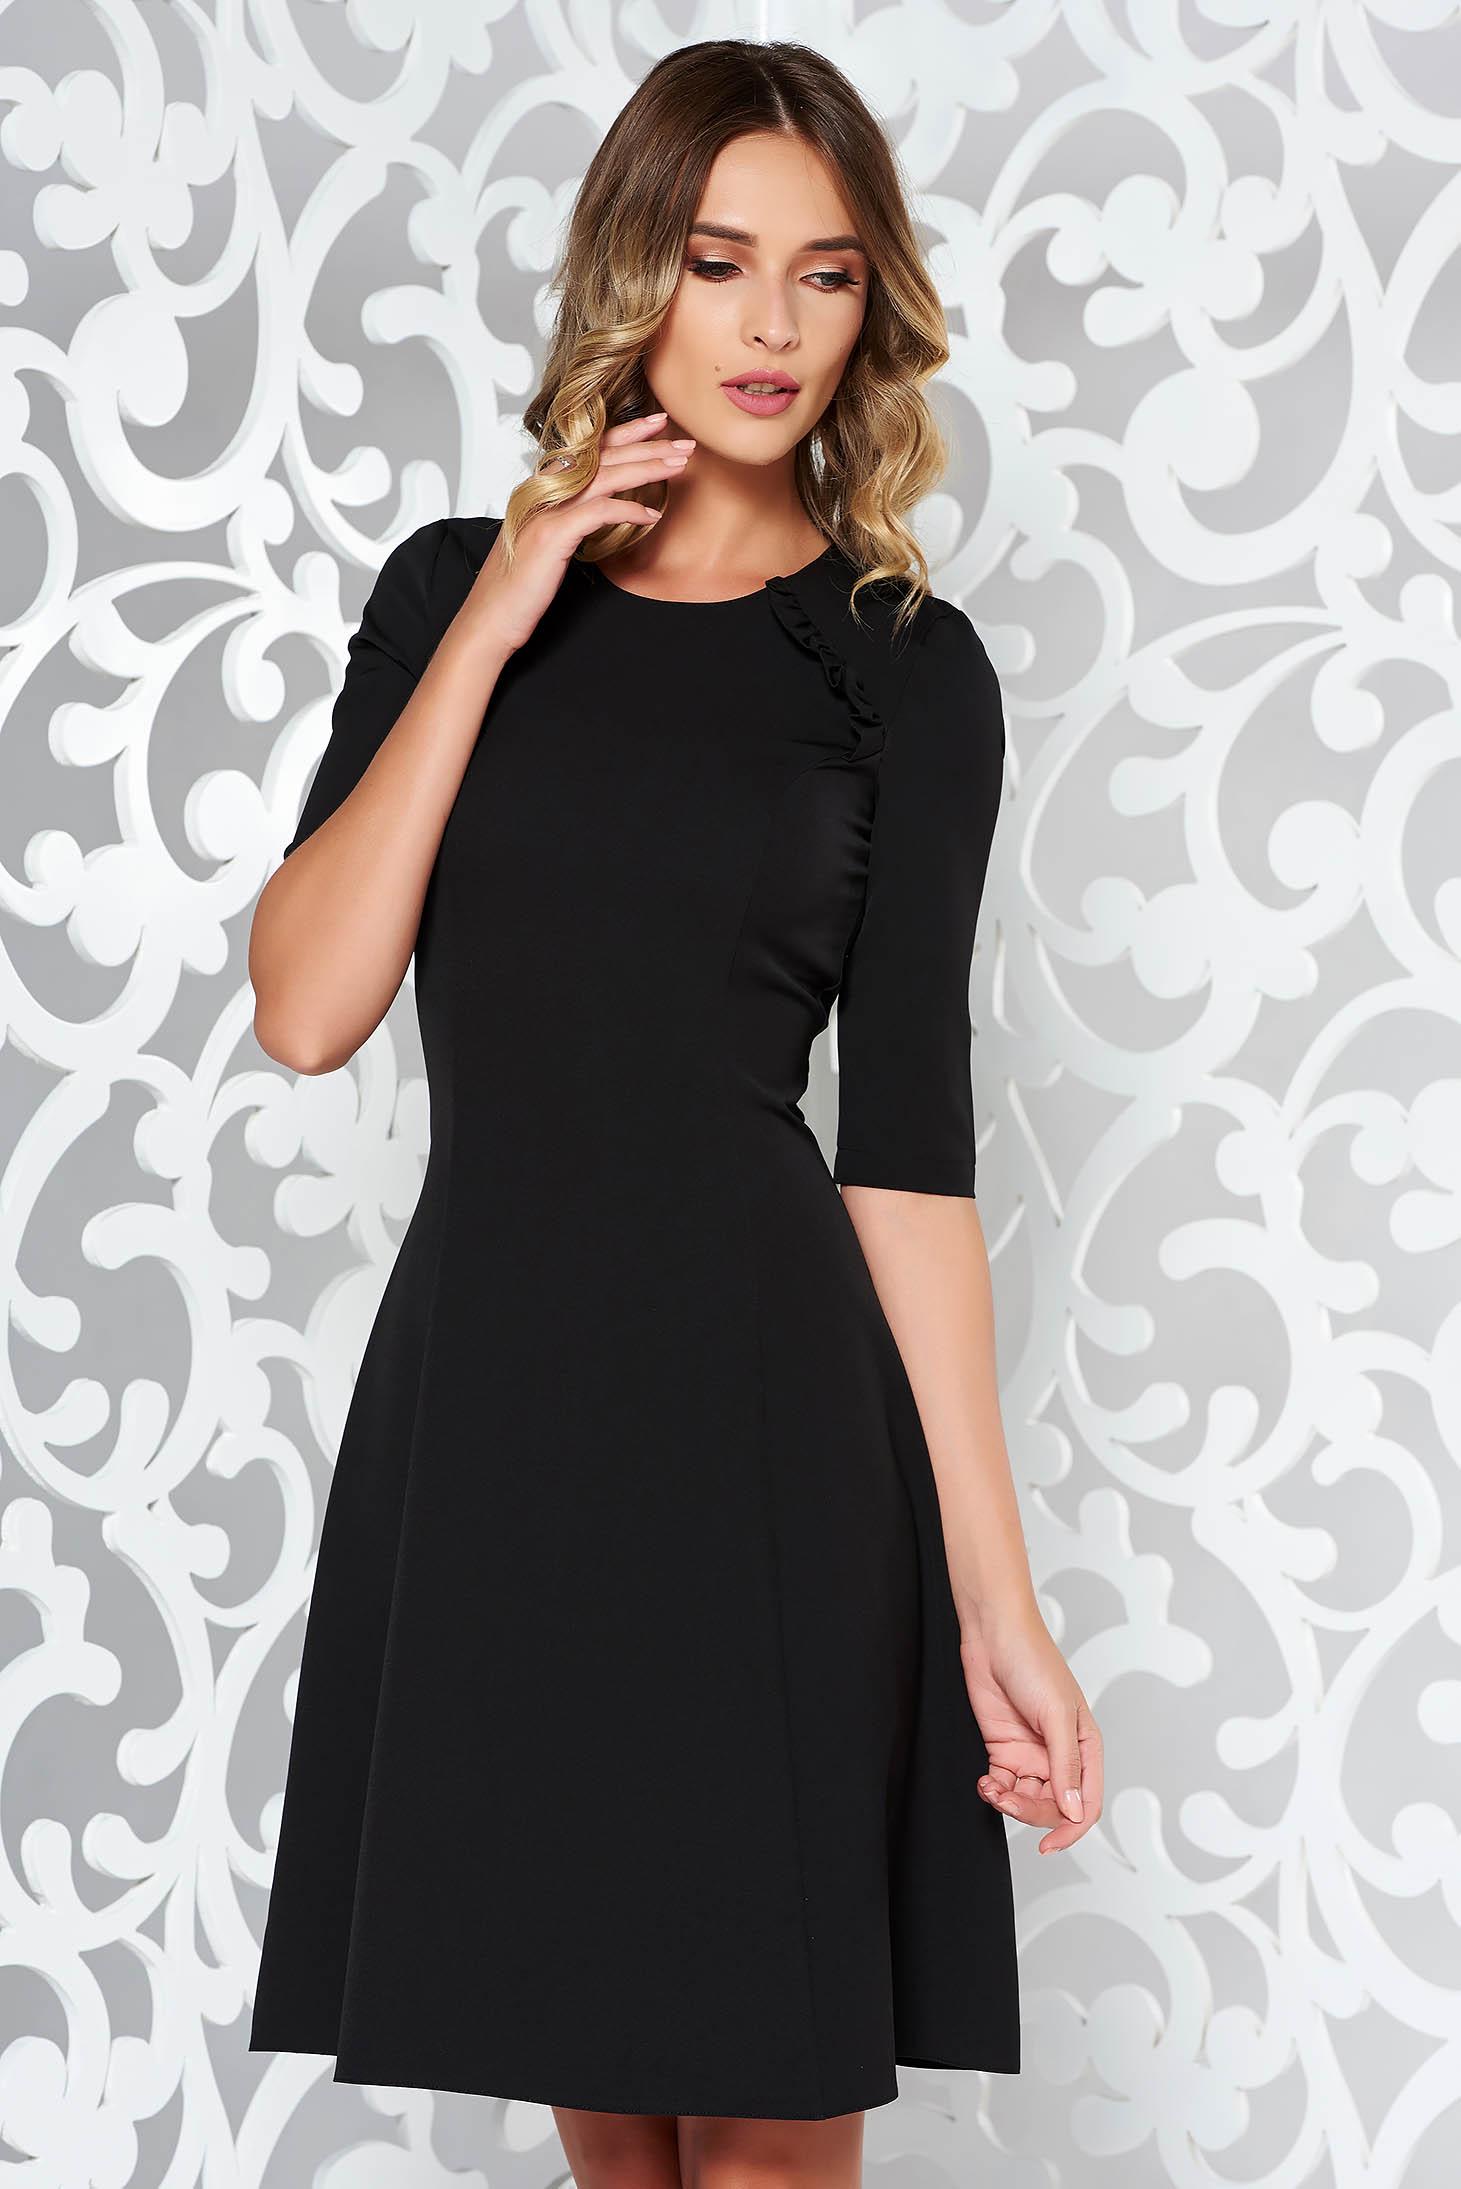 StarShinerS black dress office cloche slightly elastic fabric midi with ruffle details